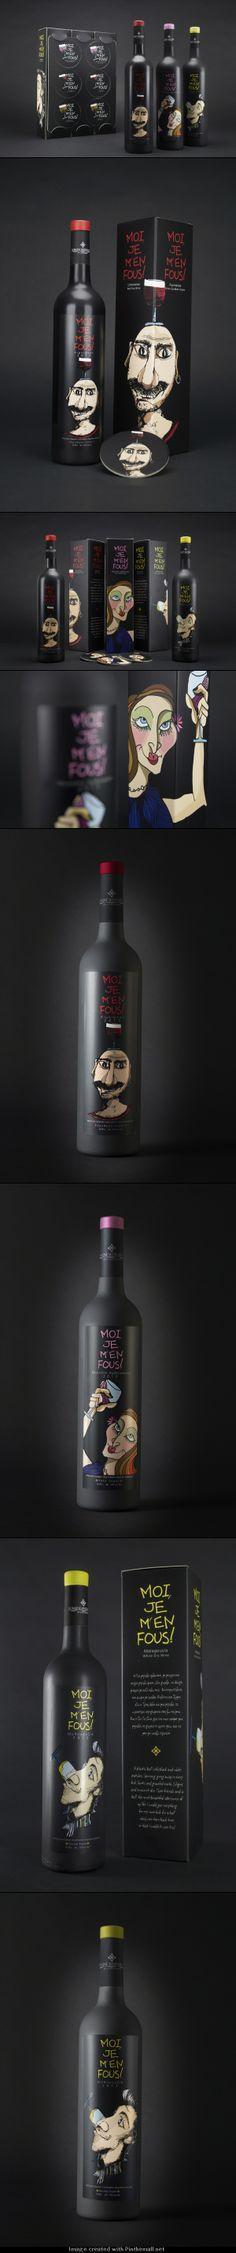 MOI JE M 'EN FOUS! Wine Series for DOMAINE MESSENICOLAS